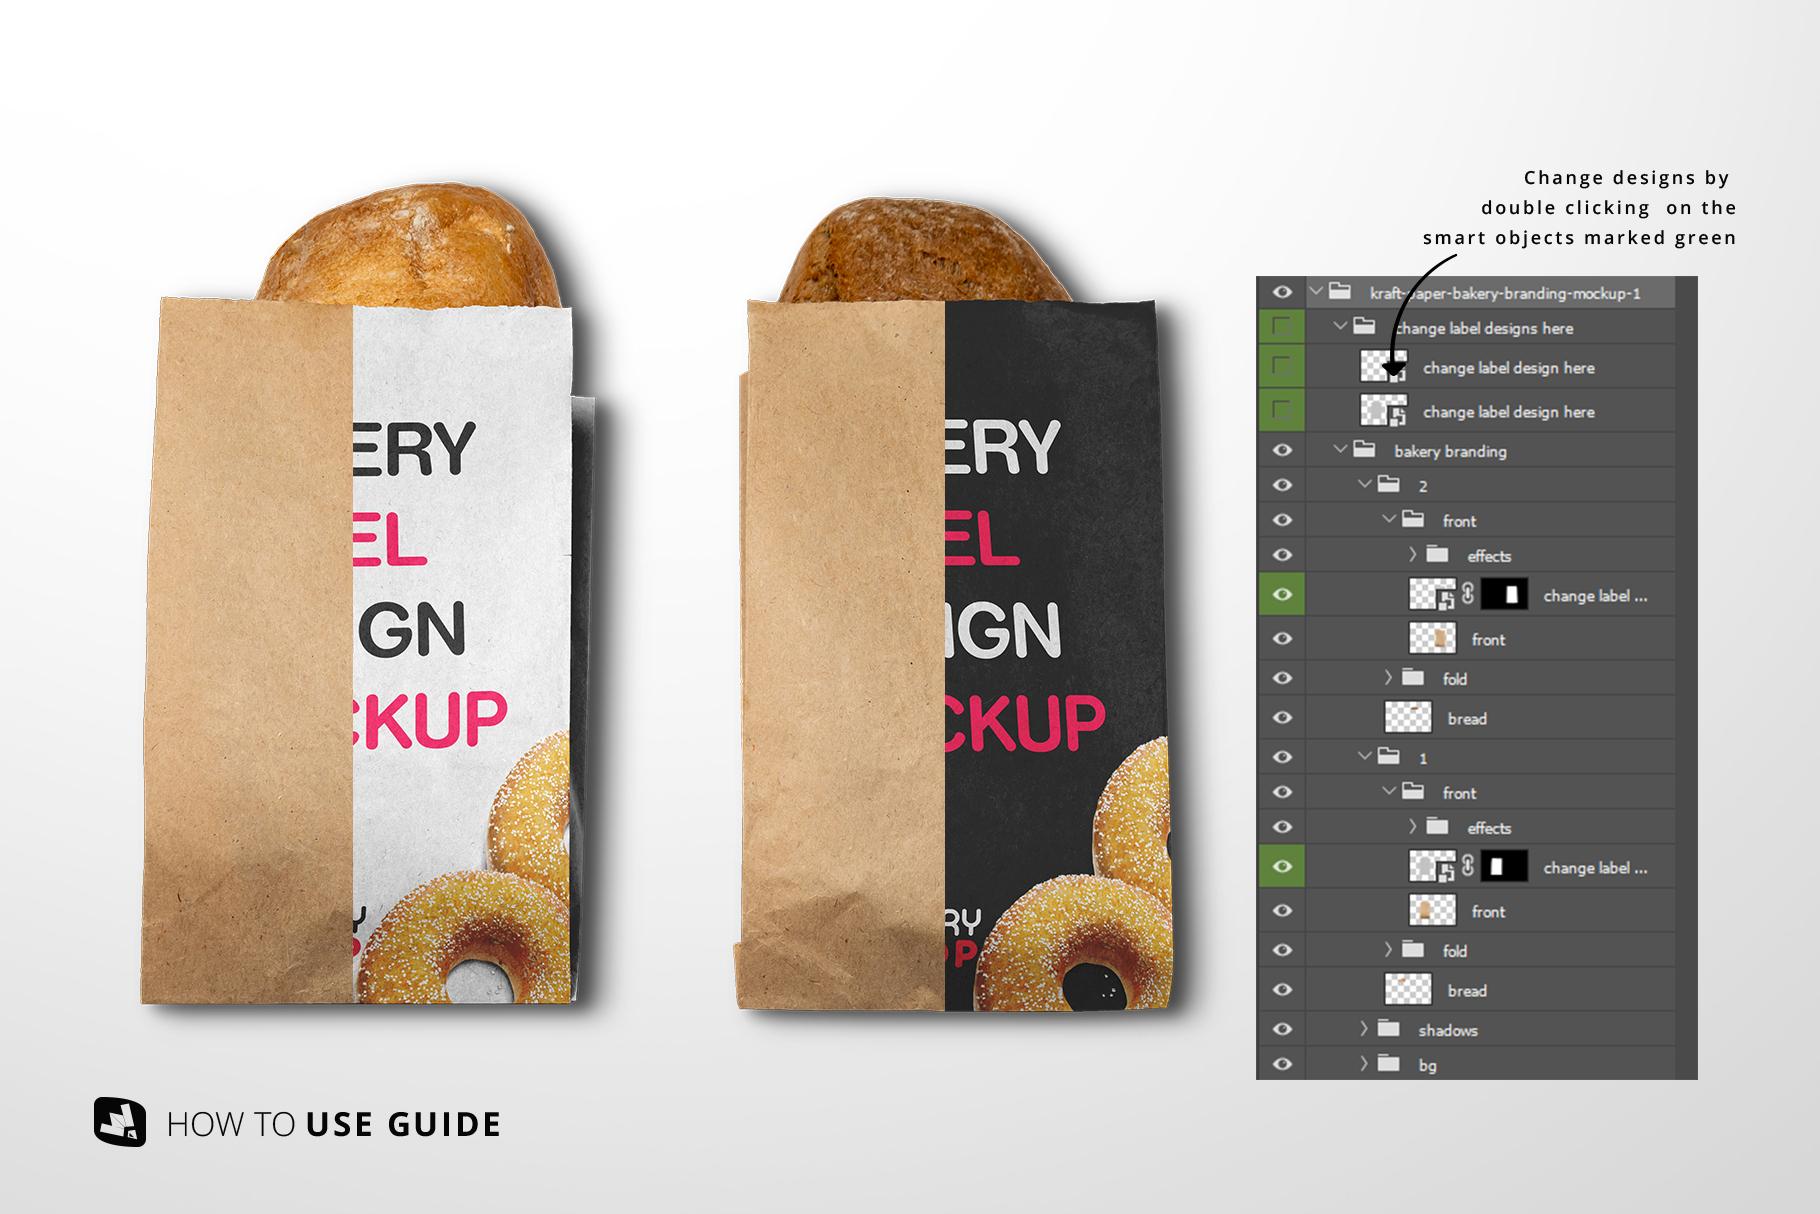 change label design of the kraft paper bakery branding mockup